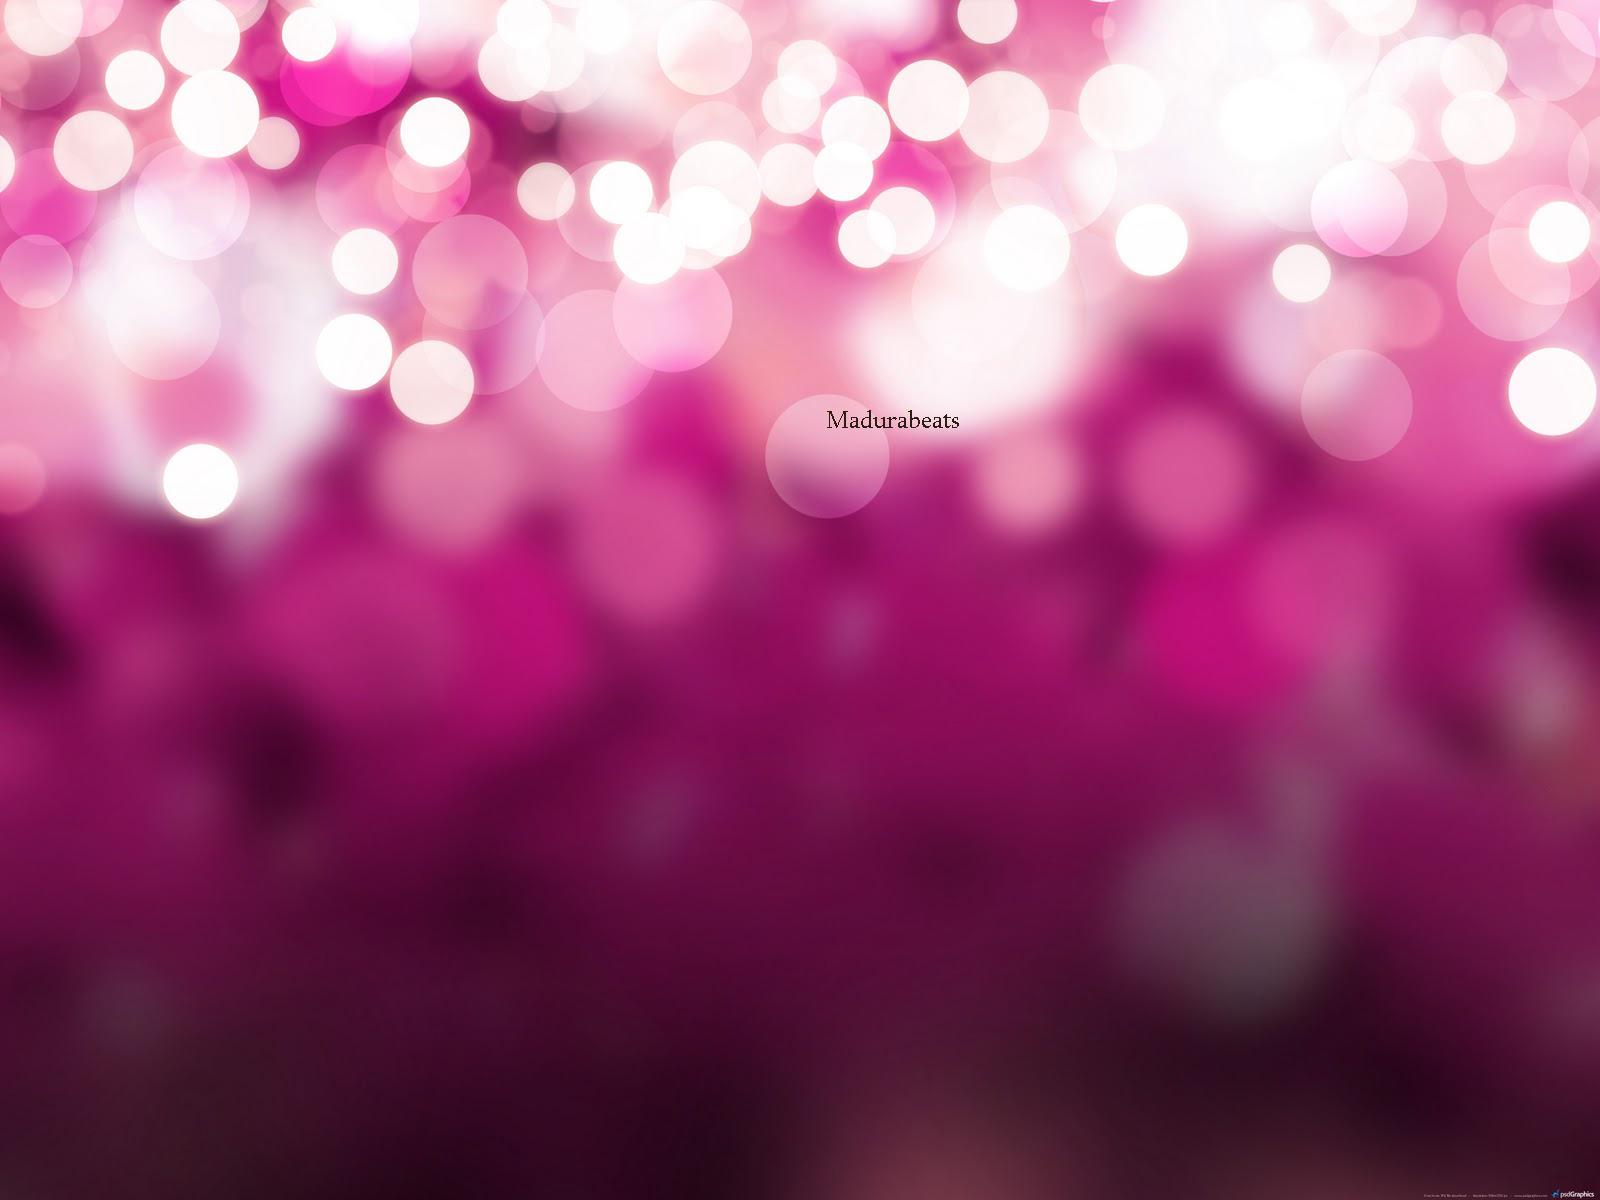 http://1.bp.blogspot.com/_z4BcYVnVAso/TQIZ5pg2ZVI/AAAAAAAAAvs/YnC6adq9rxw/s1600/purple-christmas-lights-background.jpg